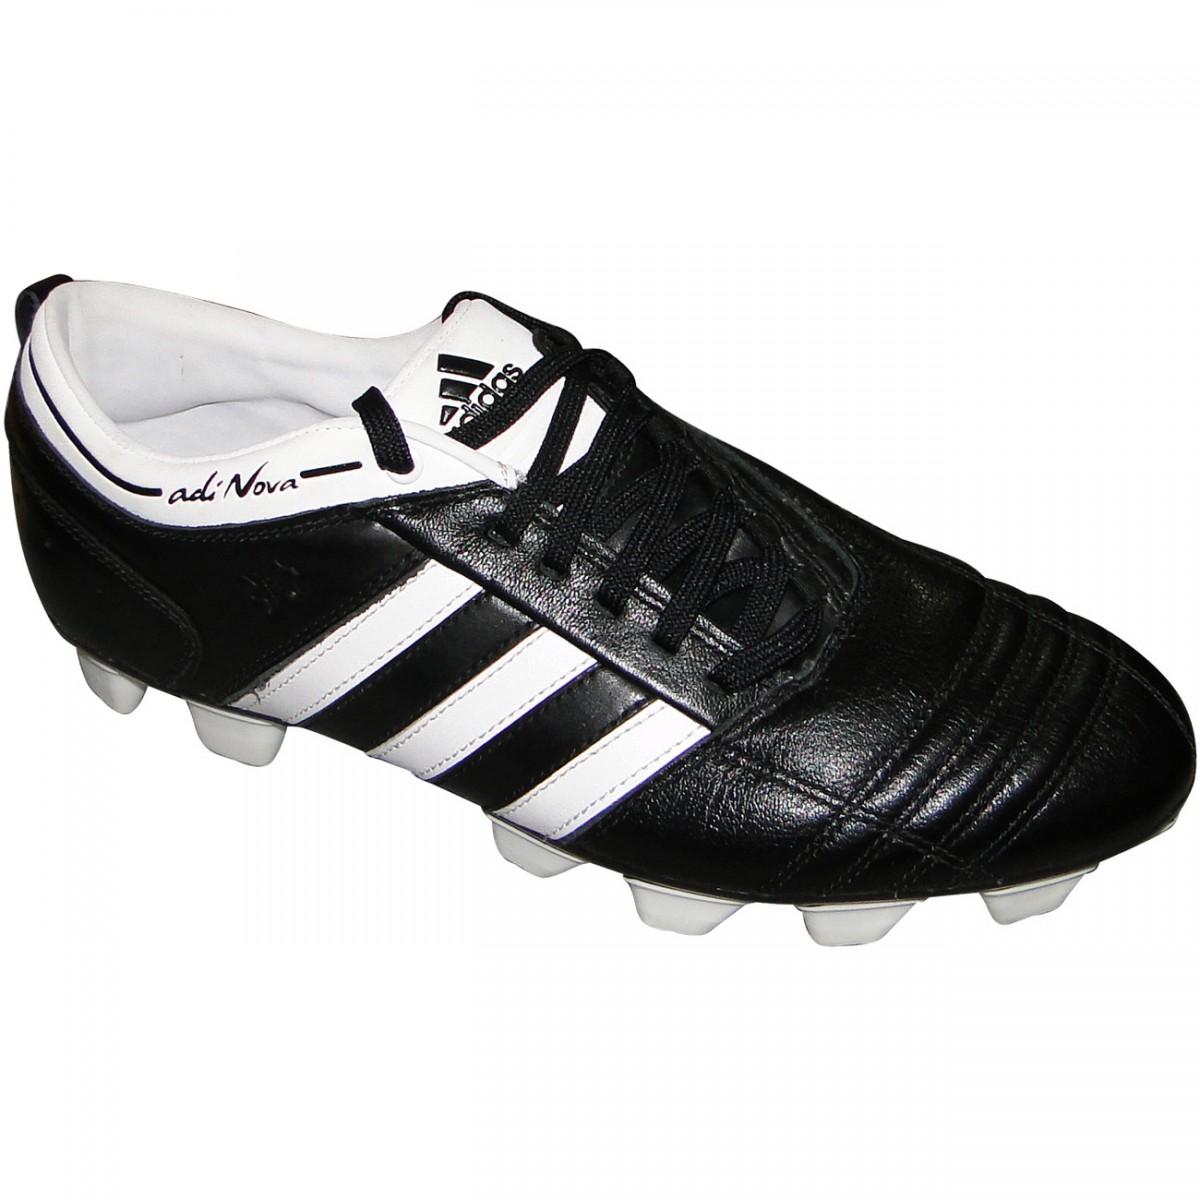 b5018c35d2 Chuteira Adidas Adinova Trx 9864 - PRETO BRANCO - Chuteira Nike ...